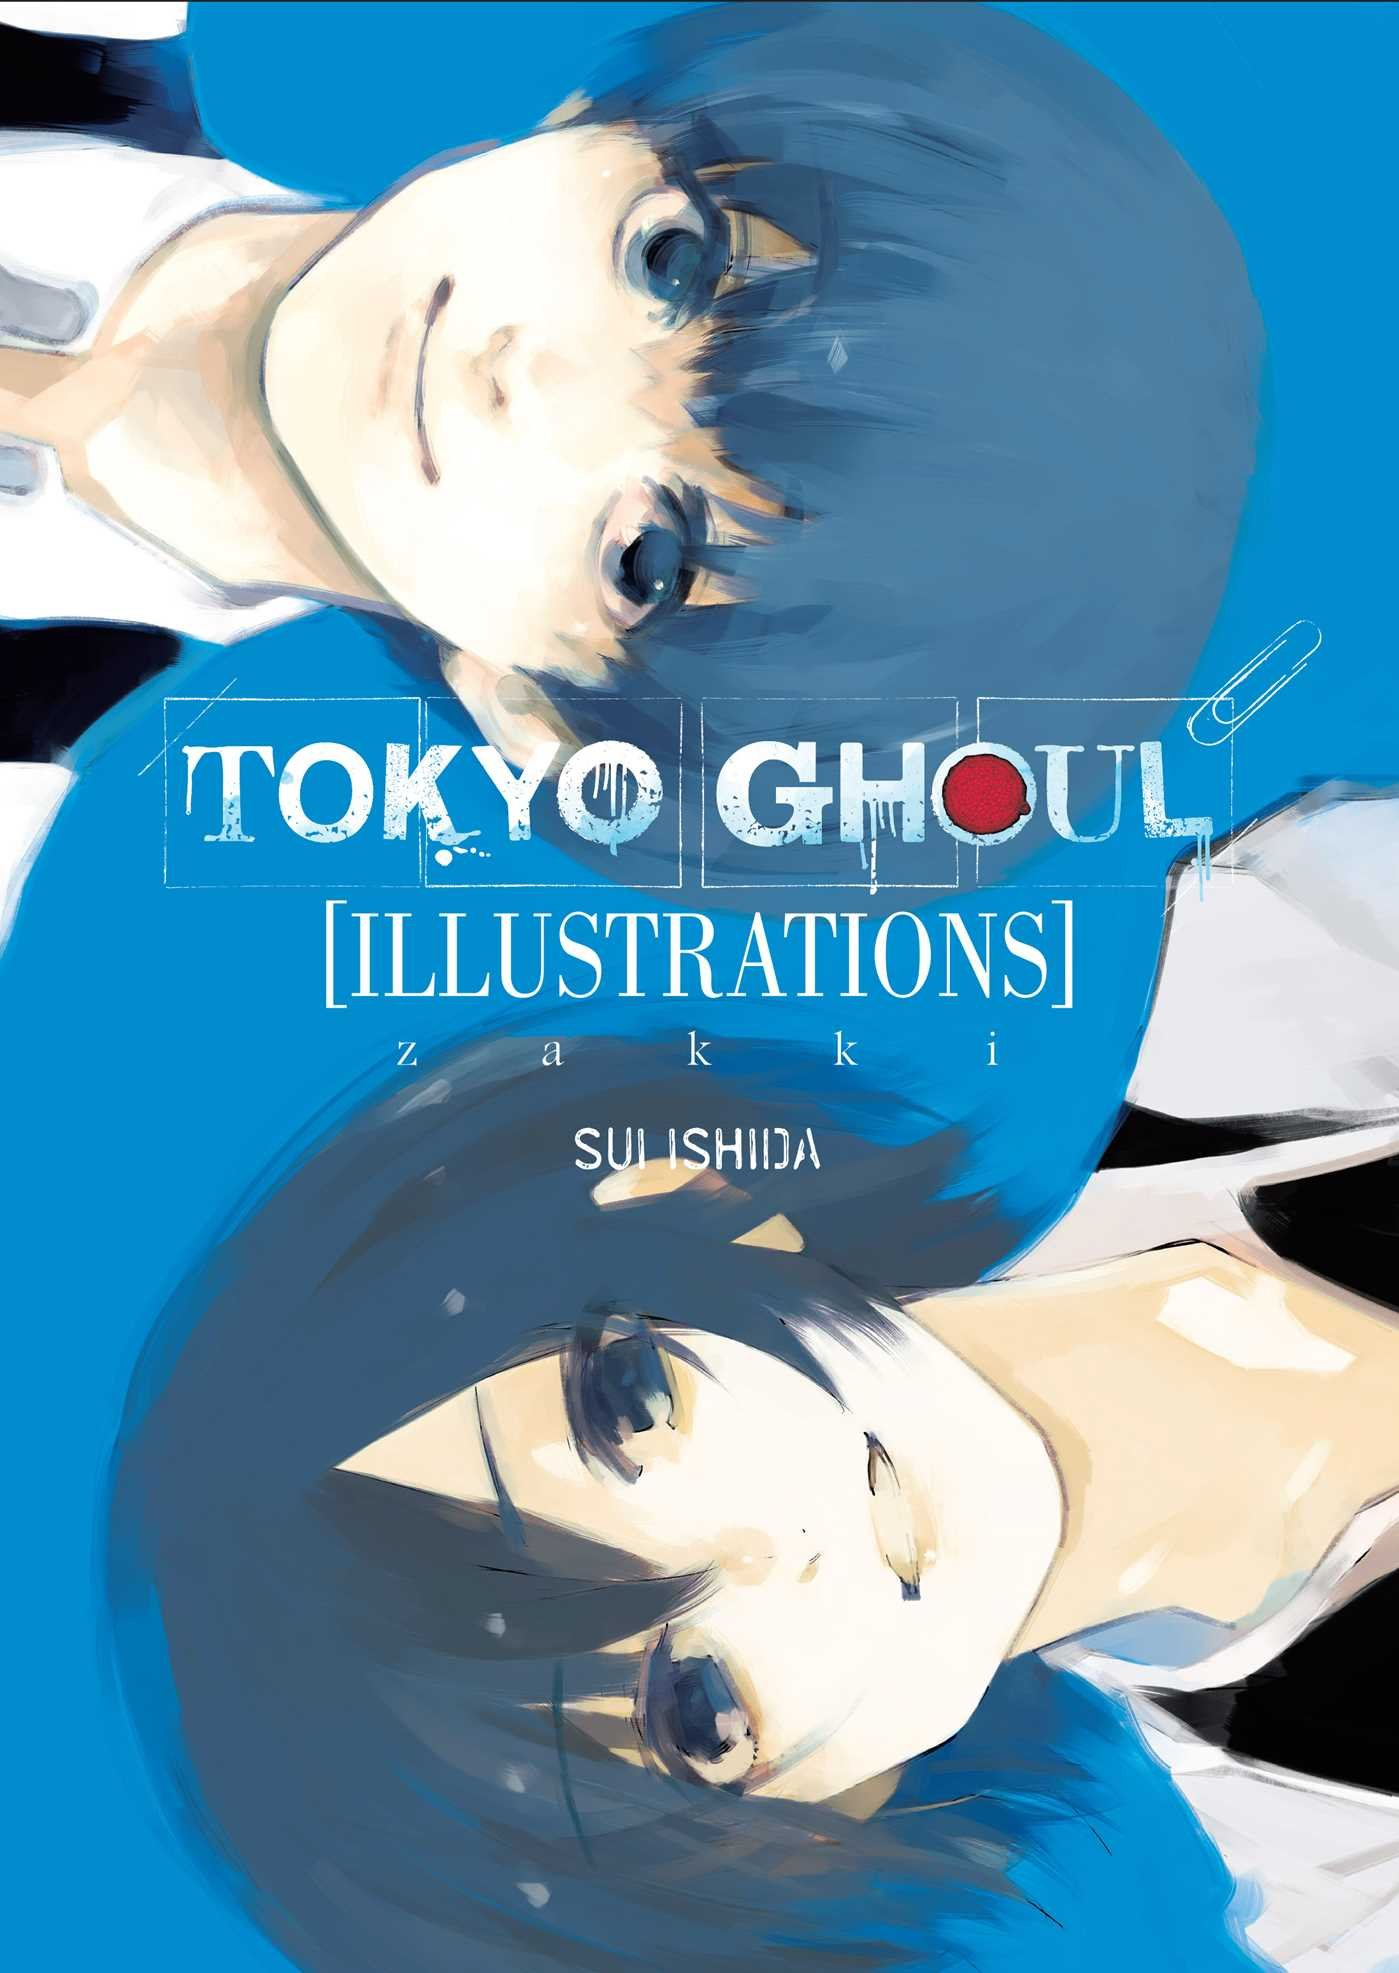 Tokyo Ghoul Illustrations Sui Ishida product image